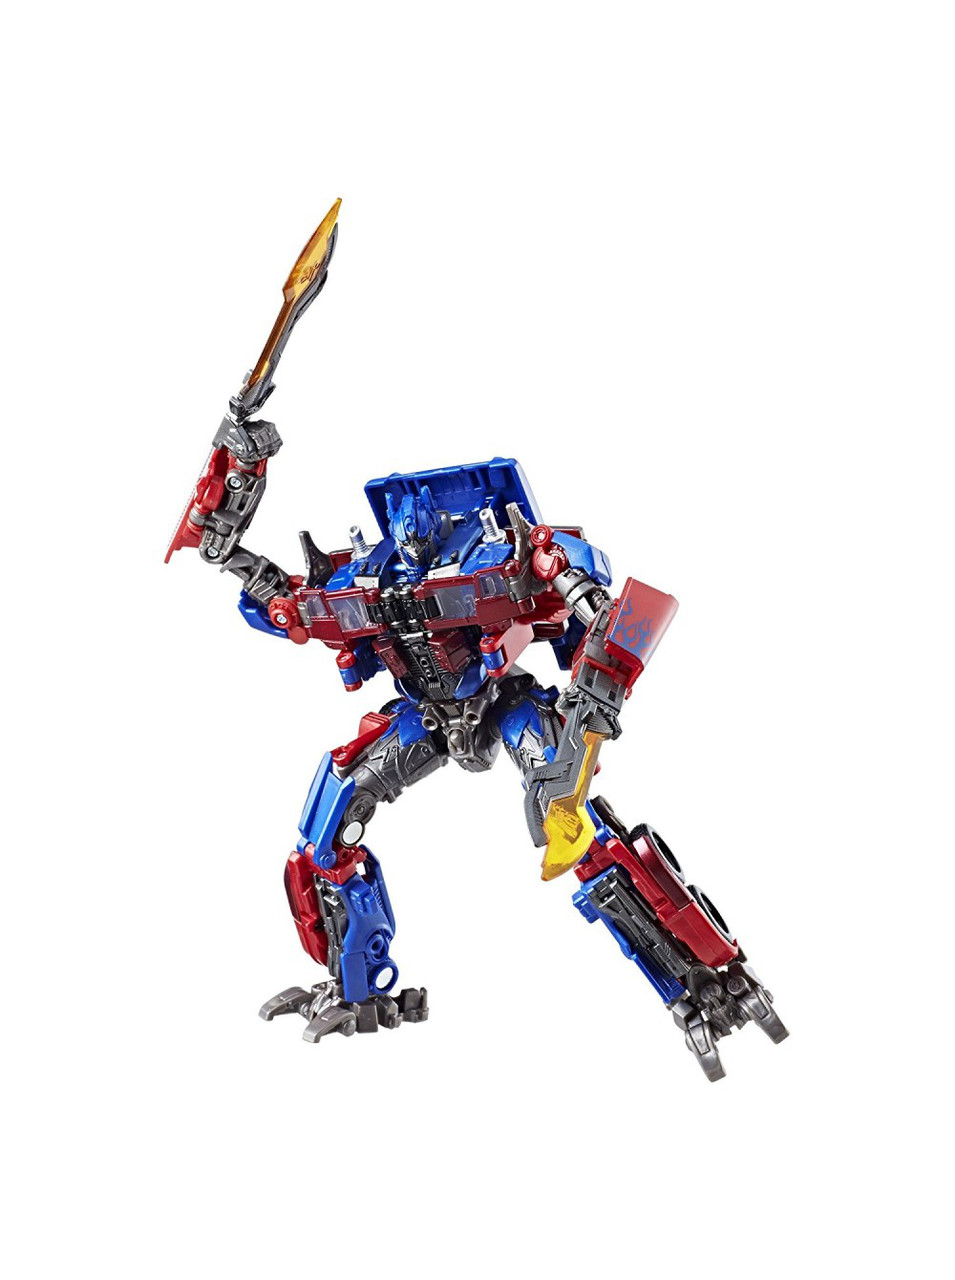 Hasbro Трансформеры Коллекционная фигурка Оптимус Прайм, 16 см